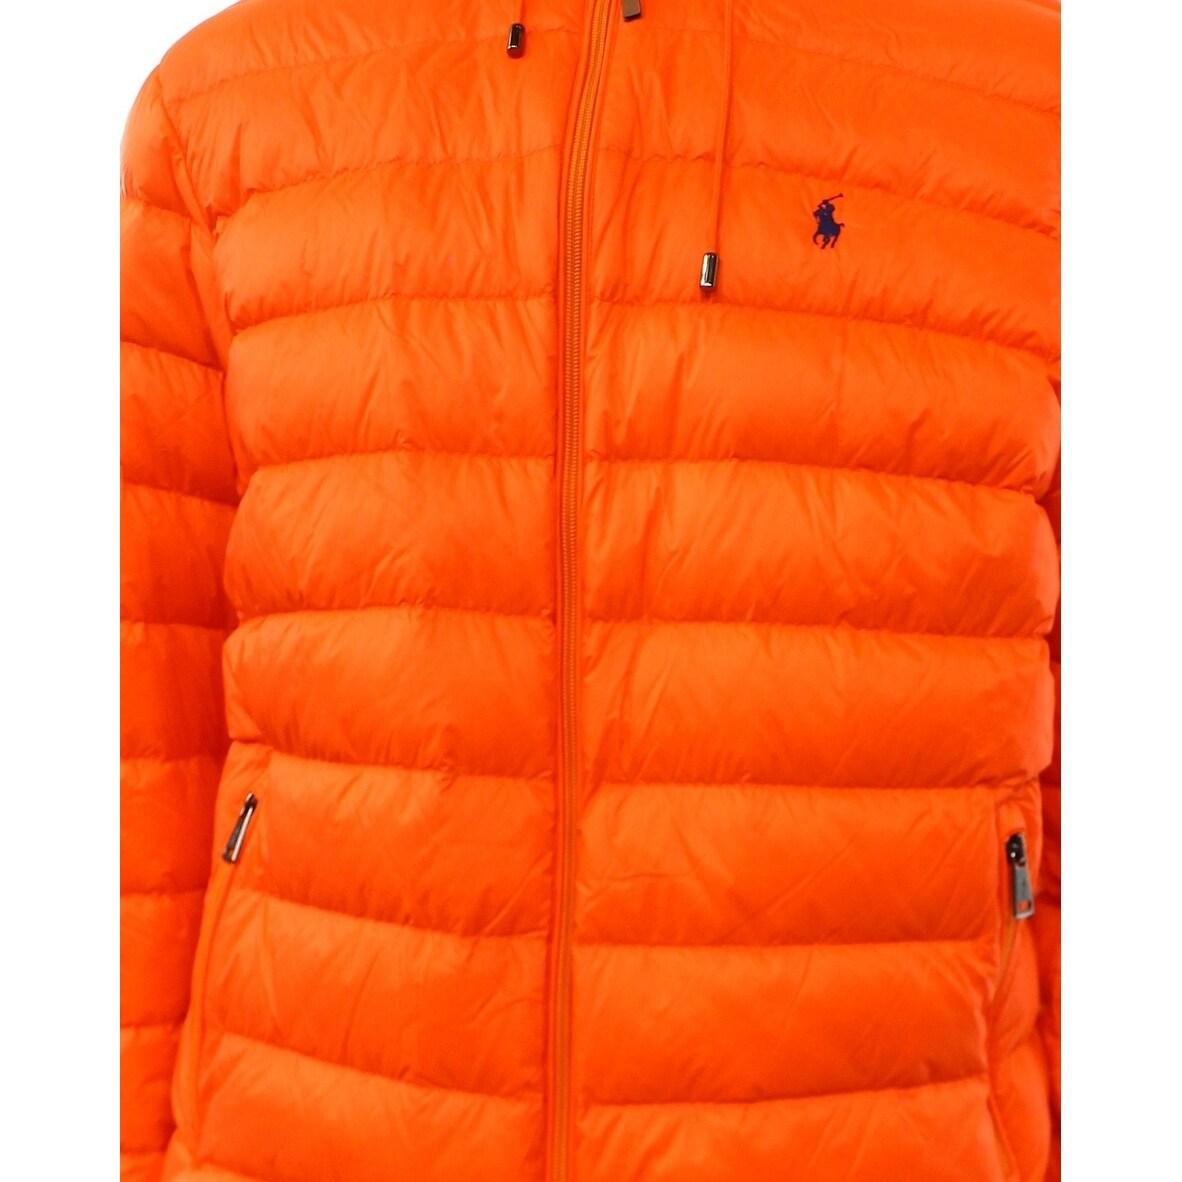 Size Puffer Jacket Polo Ralph Lauren Mens New Pocket Zip Down Xl Orange Yfvb7y6g